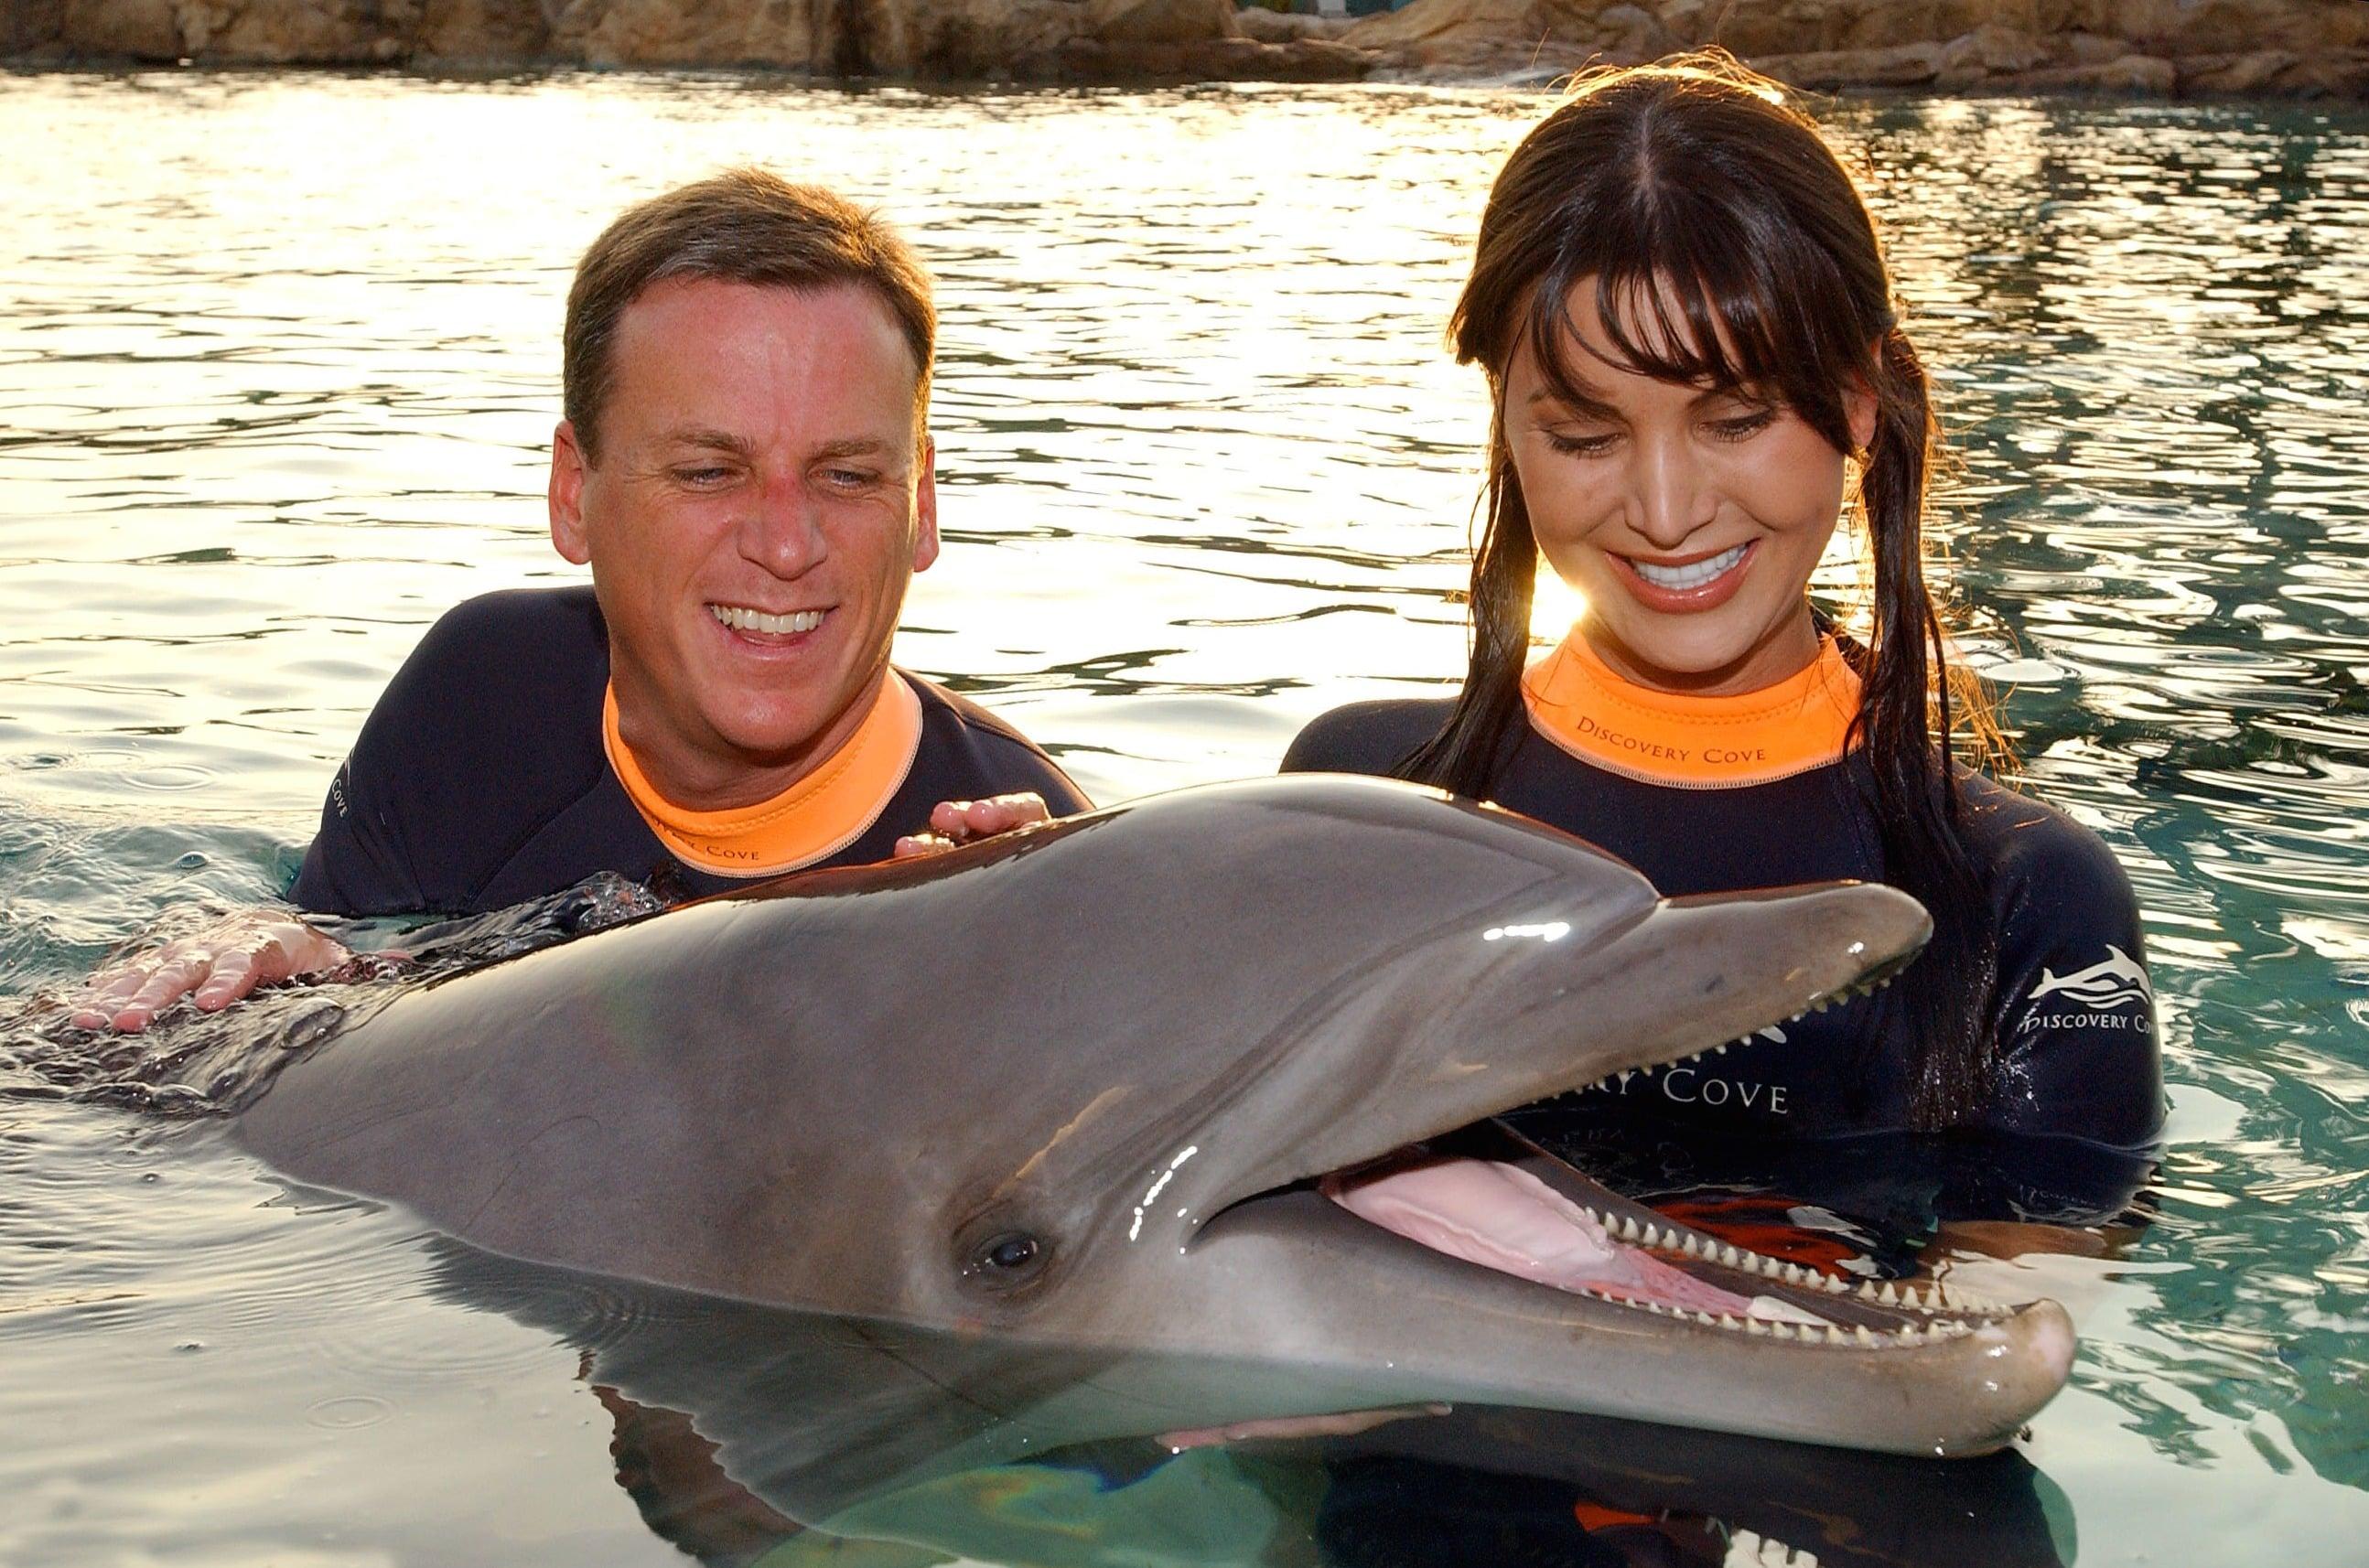 Discovery Cove Special Ocassions Florida Resident Specials